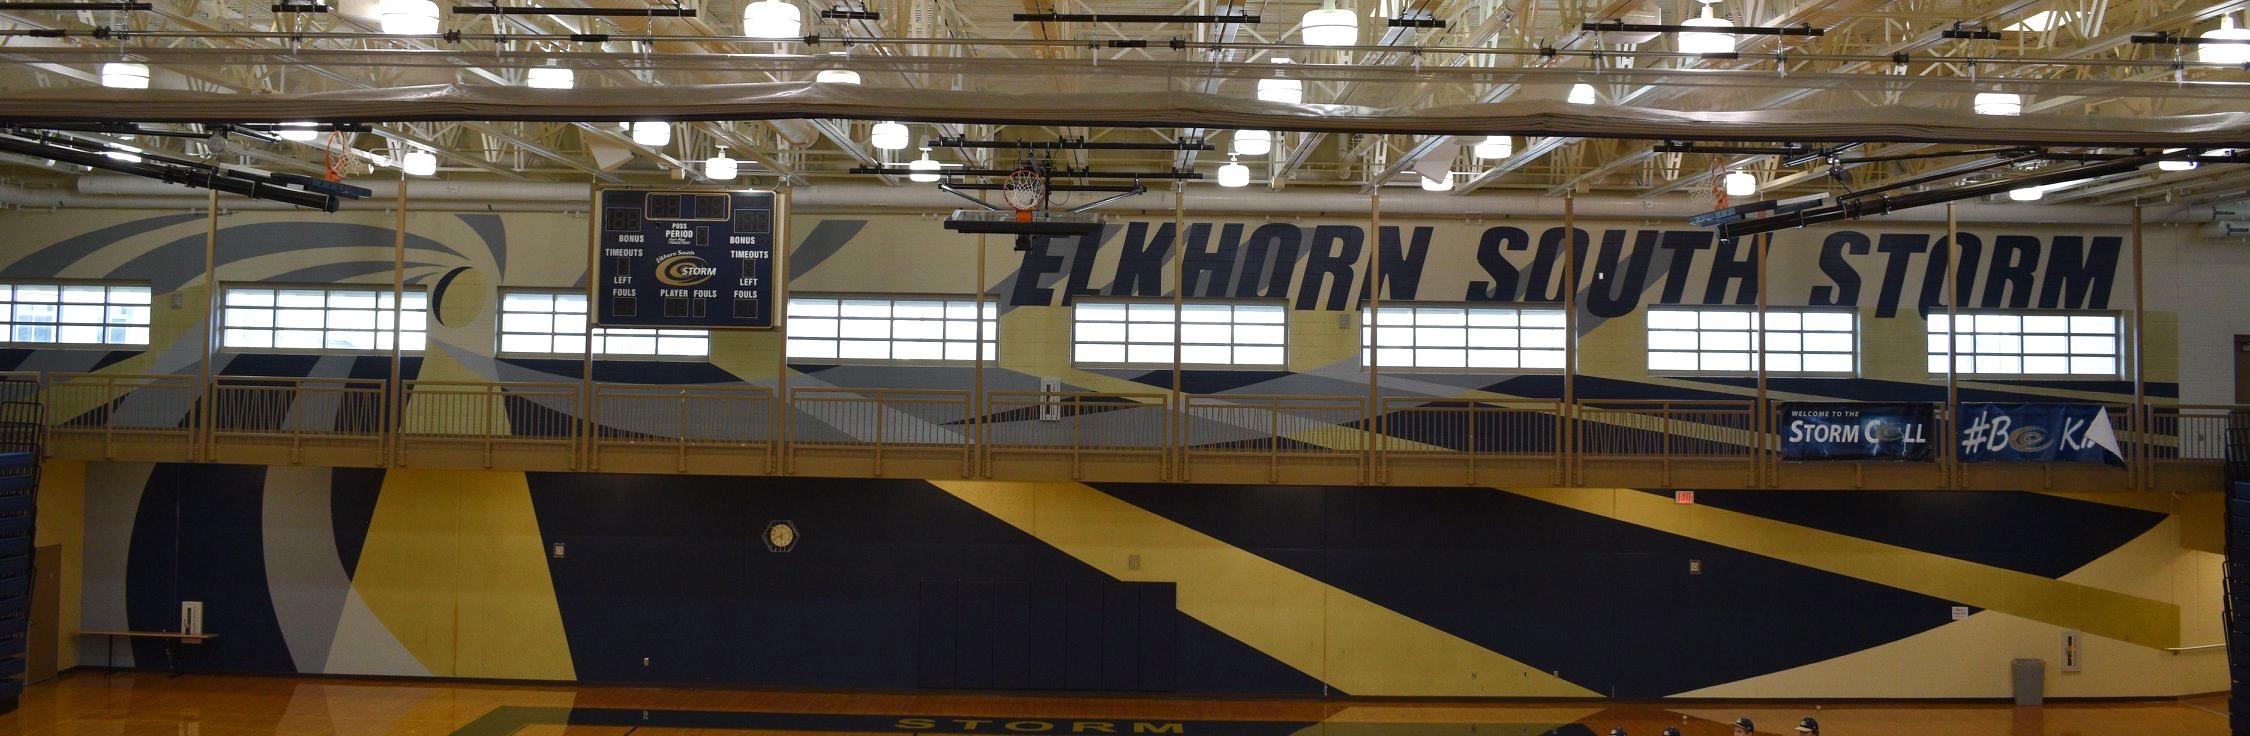 Elkhorn South